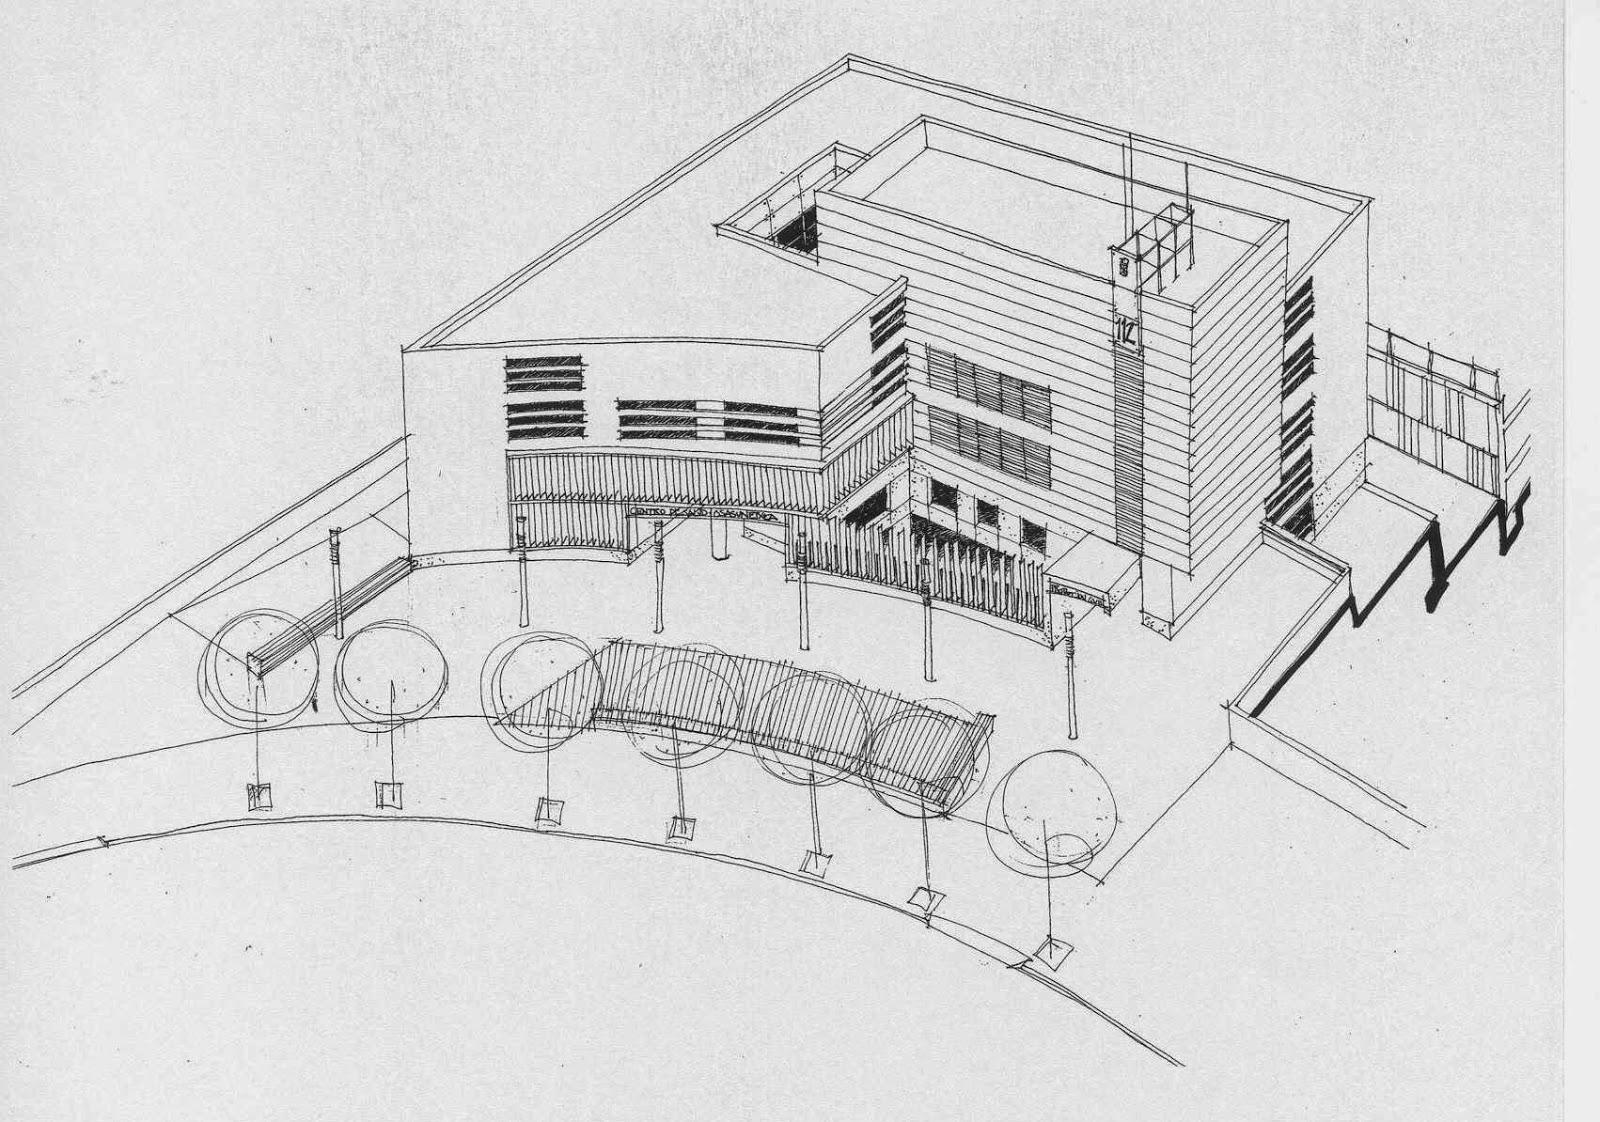 Dibujo T Cnico Dibujo Arquitect Nico # Muebles Dibujo Arquitectonico